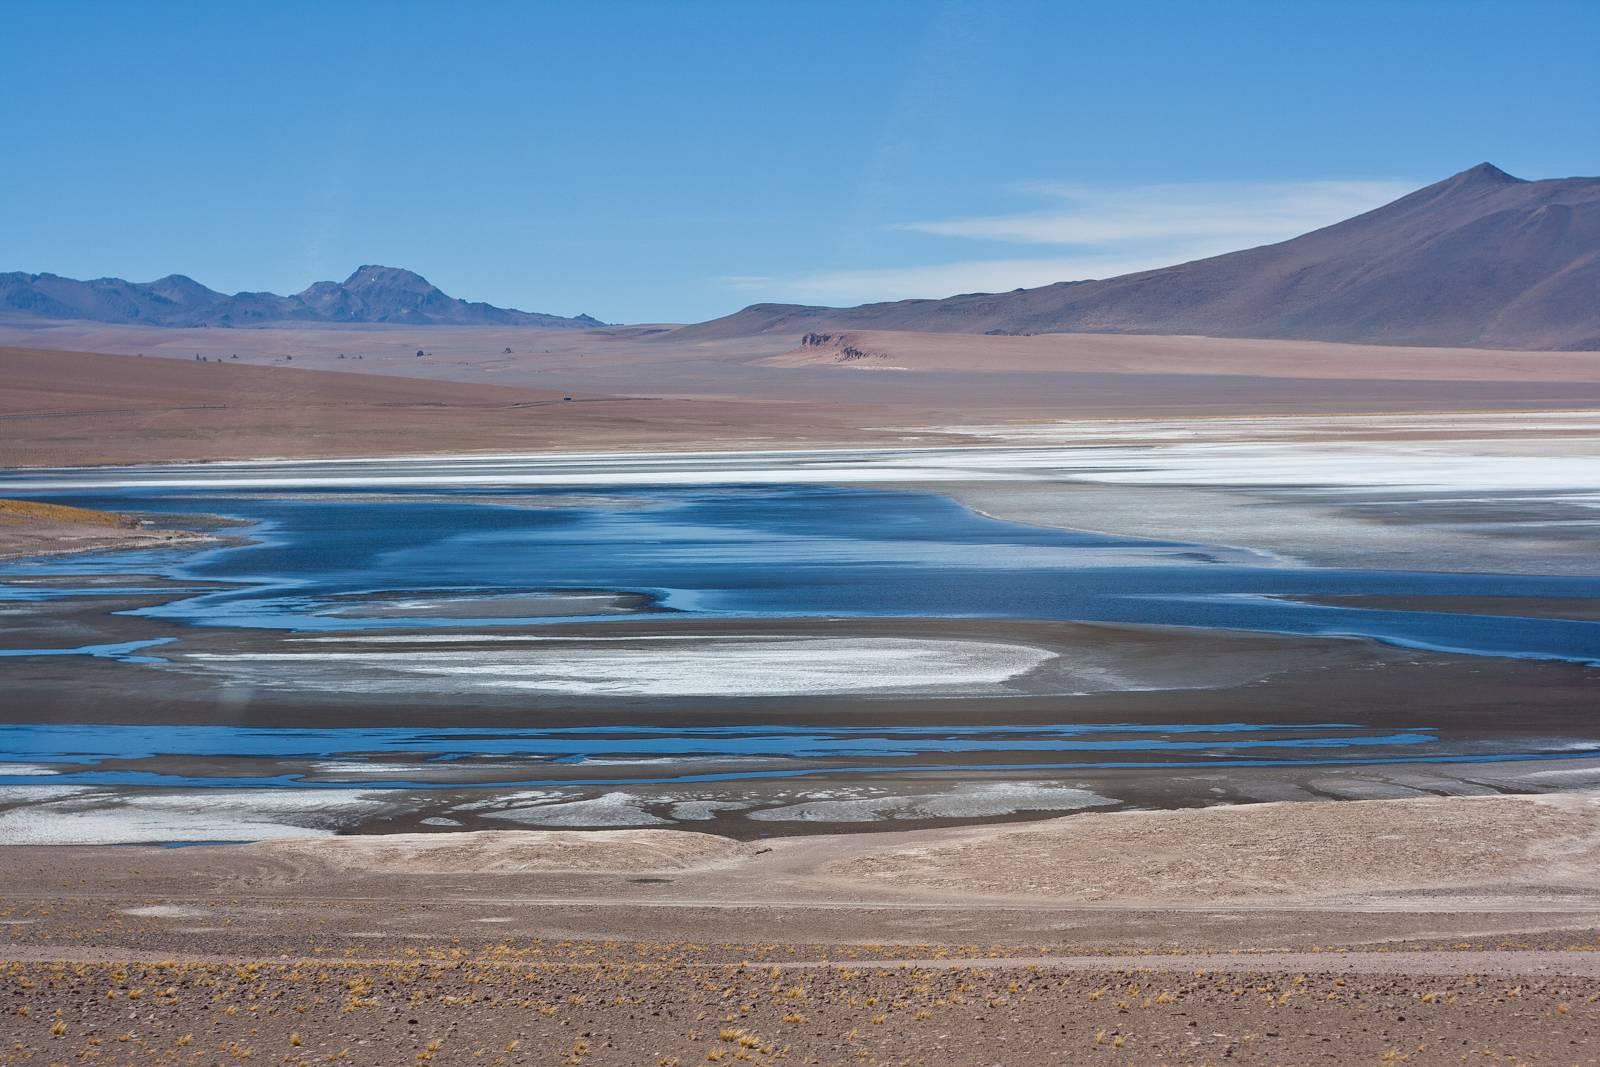 Photo 1: San Pedro de Atacama